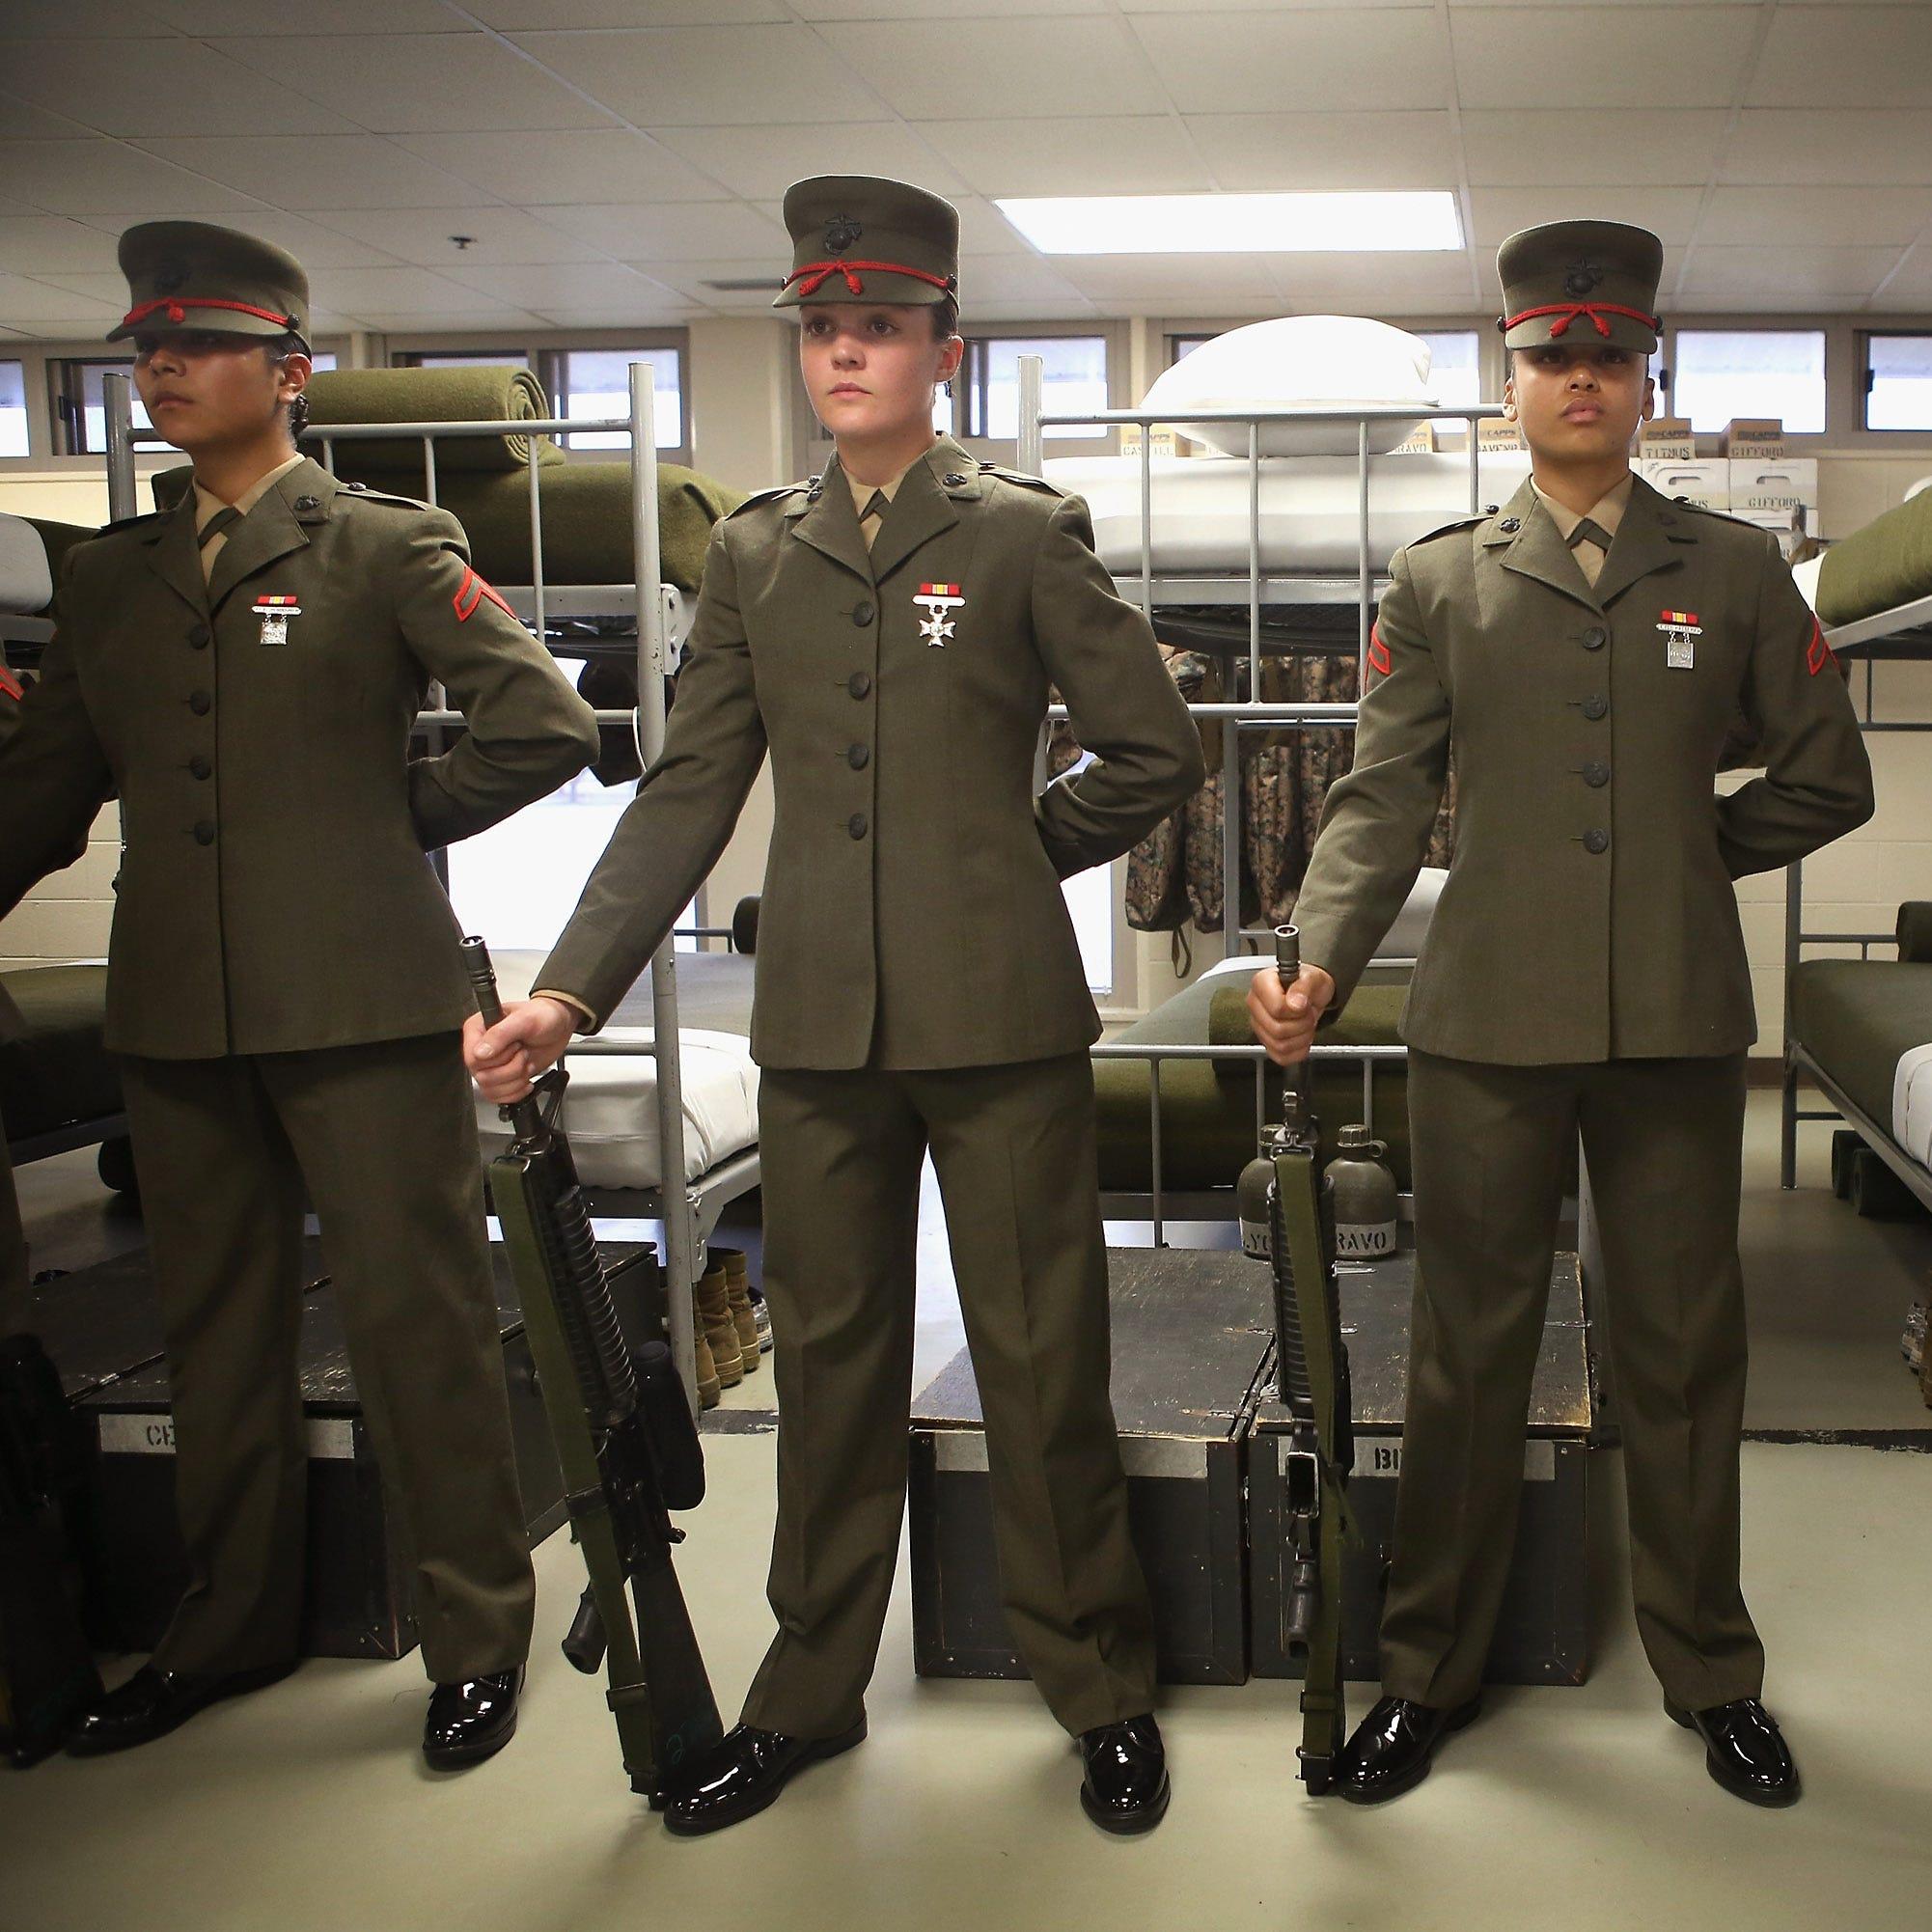 Marine veteran: There is no military need to draft women